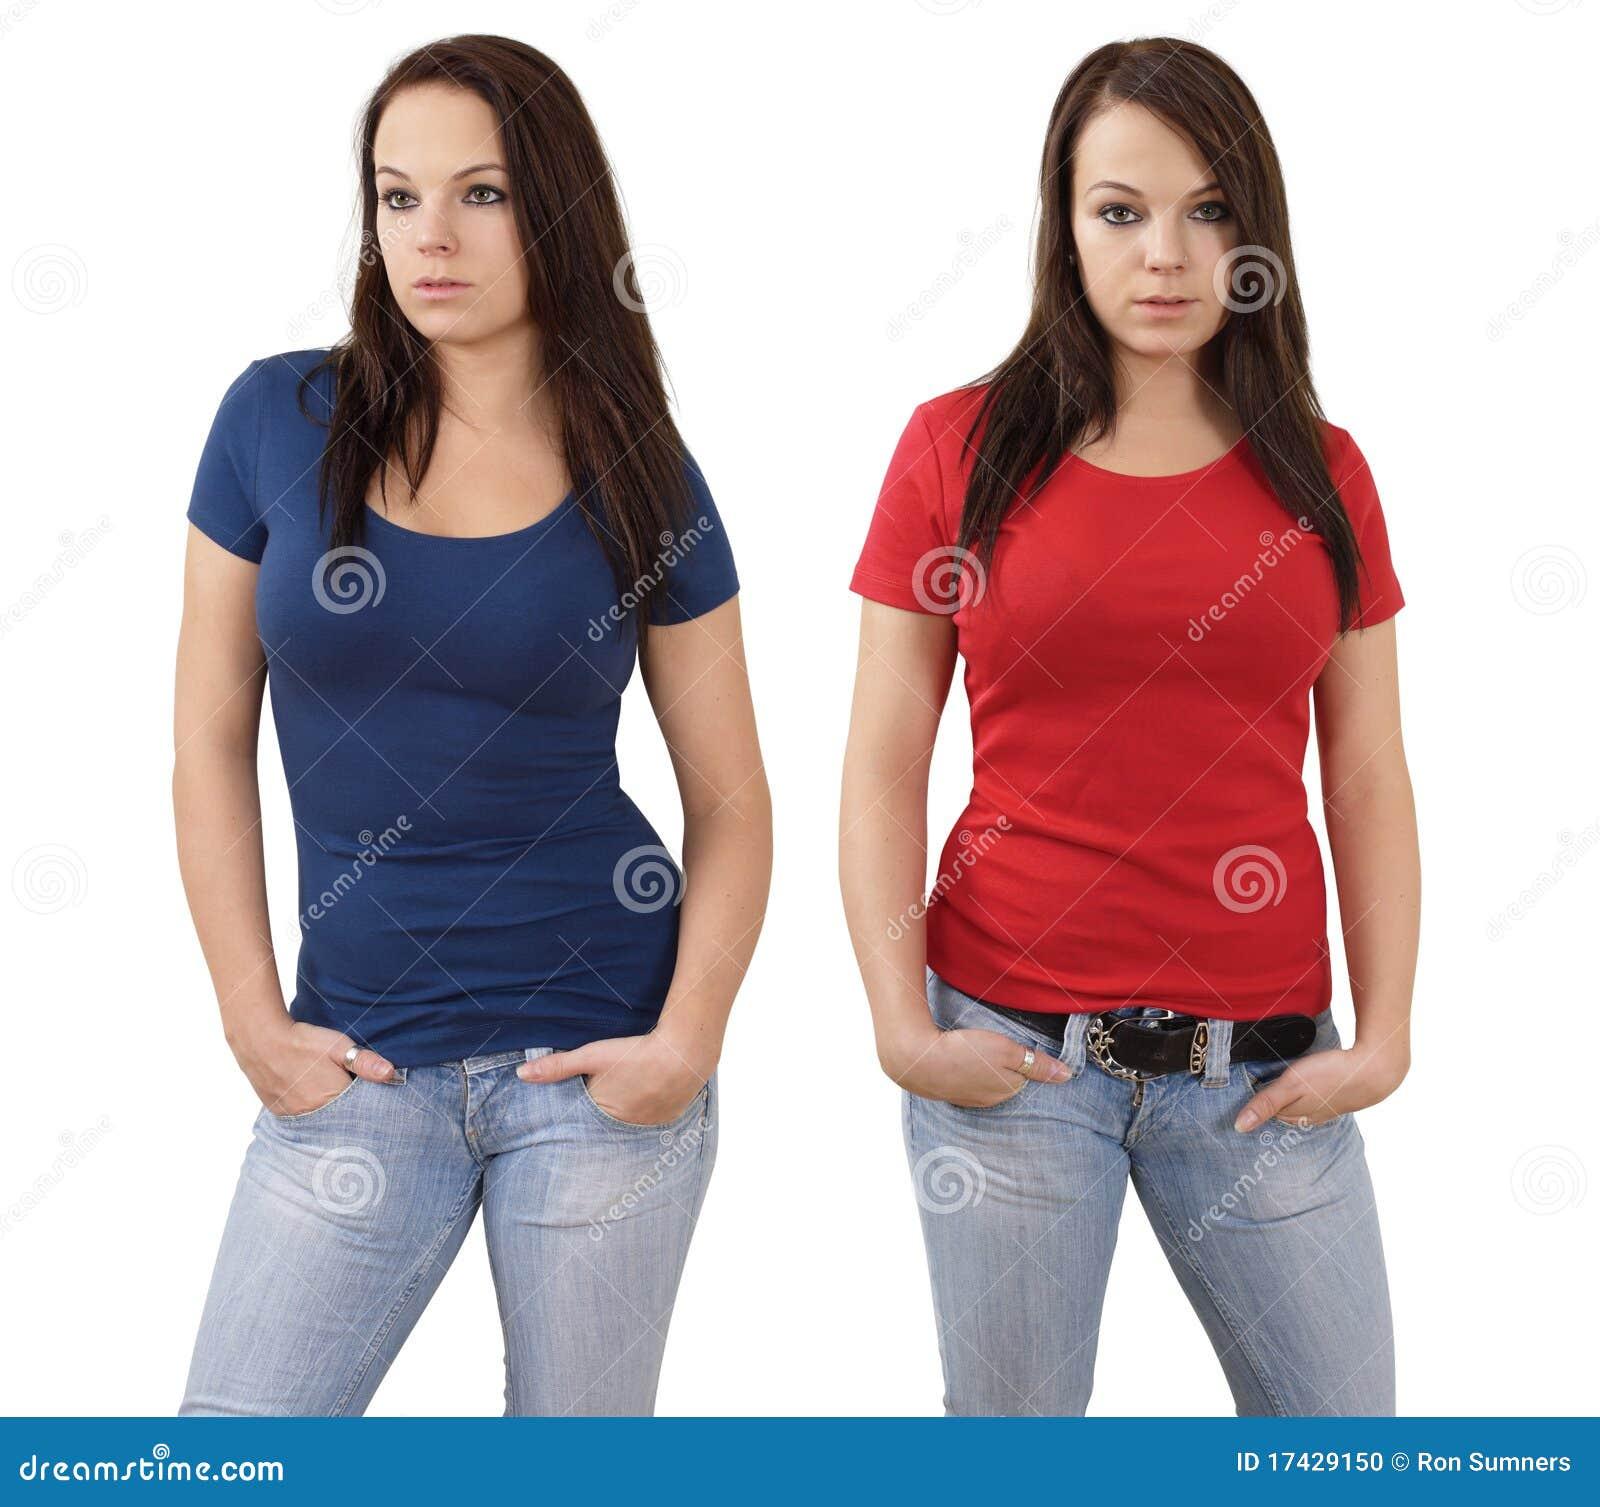 Camisas formales mujer blusas Tops de rayas roja mujeres